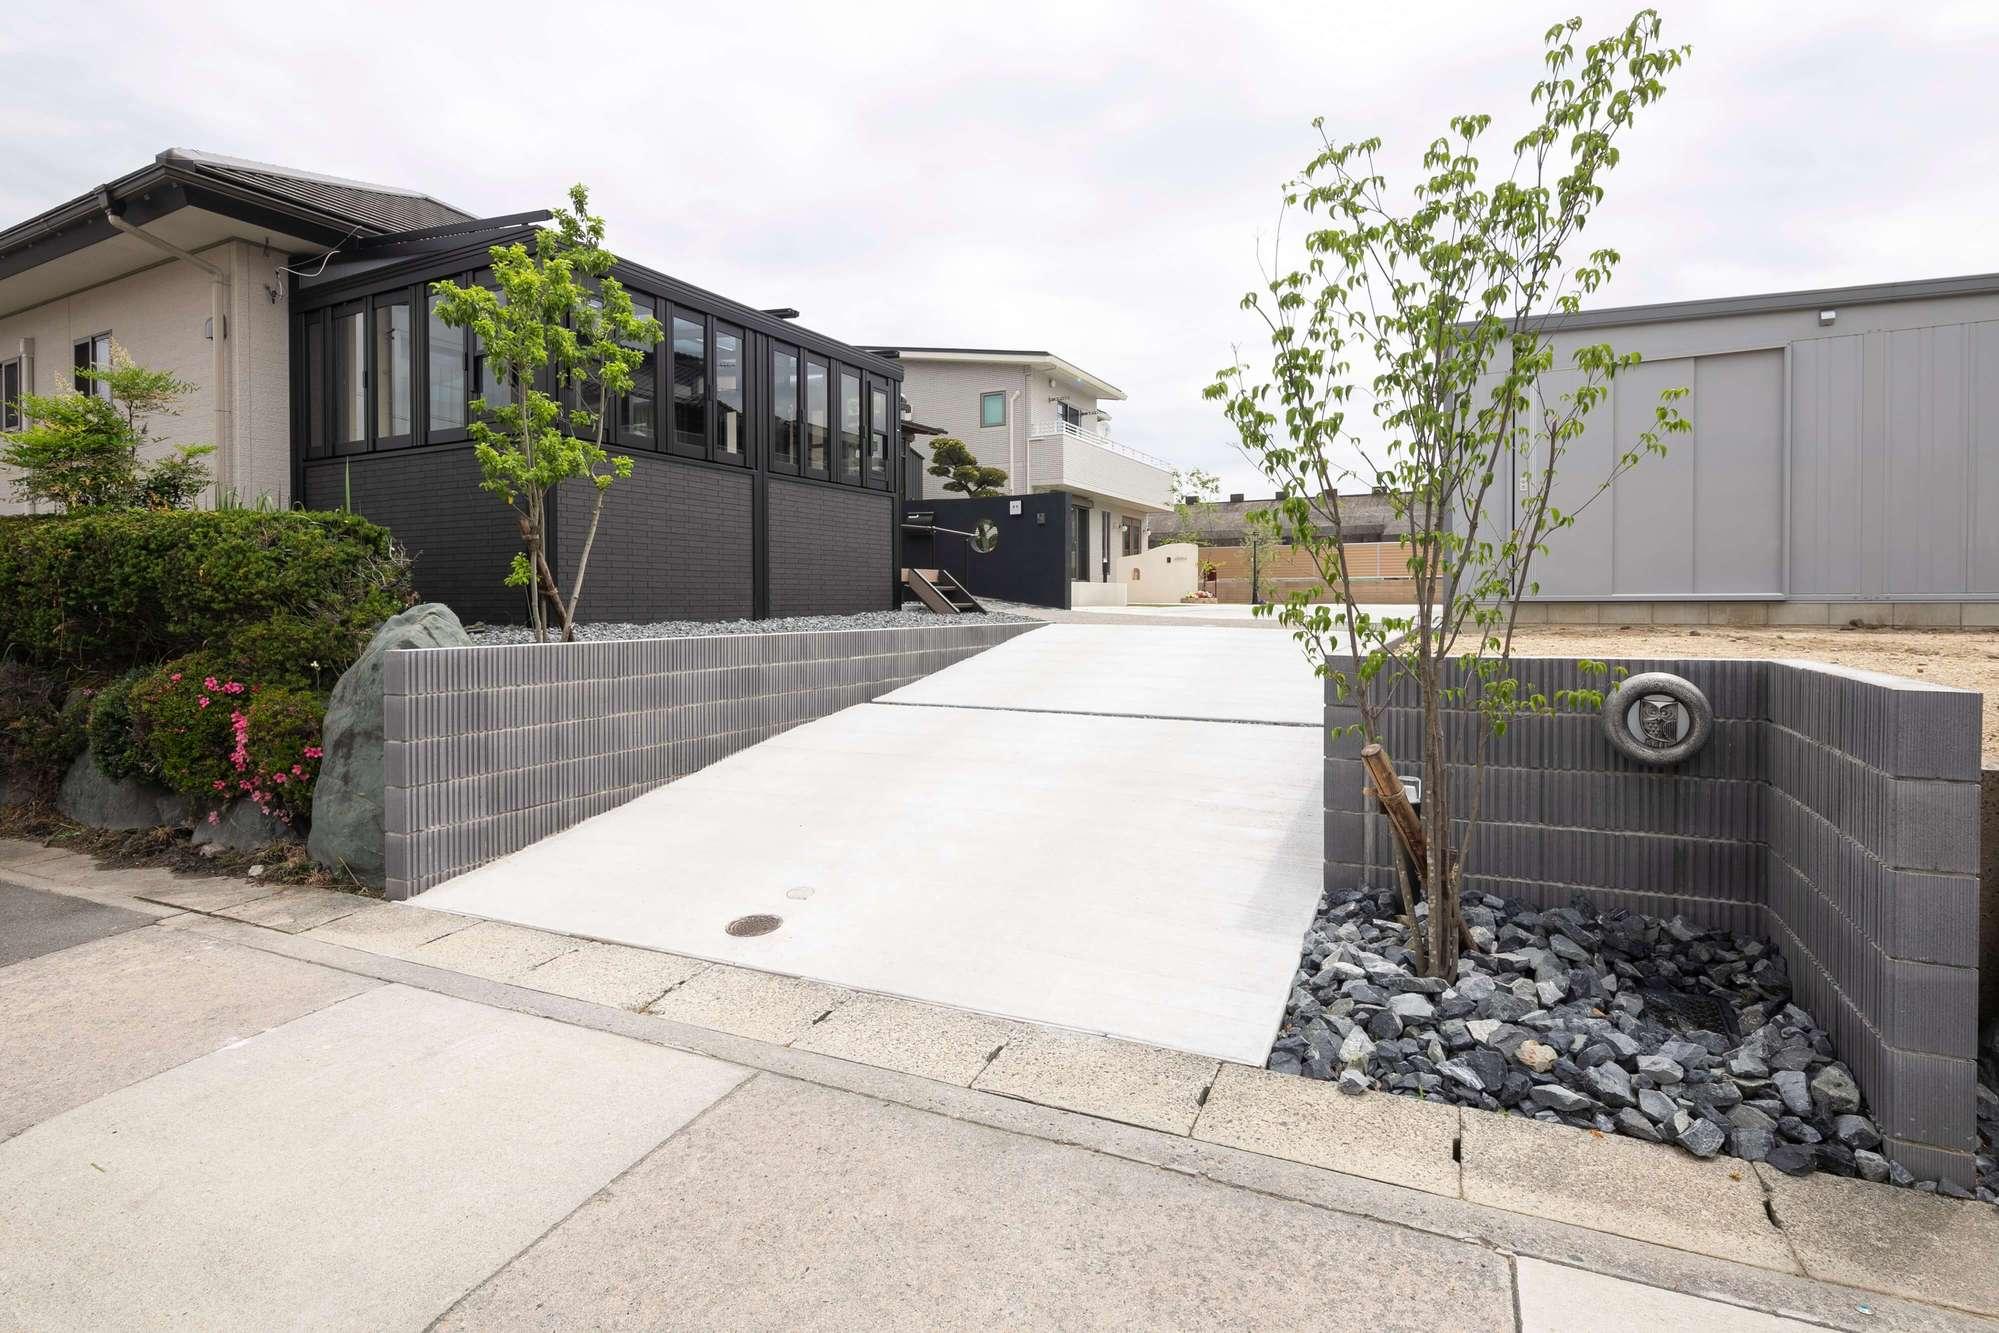 LIXIL 暖蘭物語 ガーデンルーム 二世帯住宅 モダン和風 南欧風